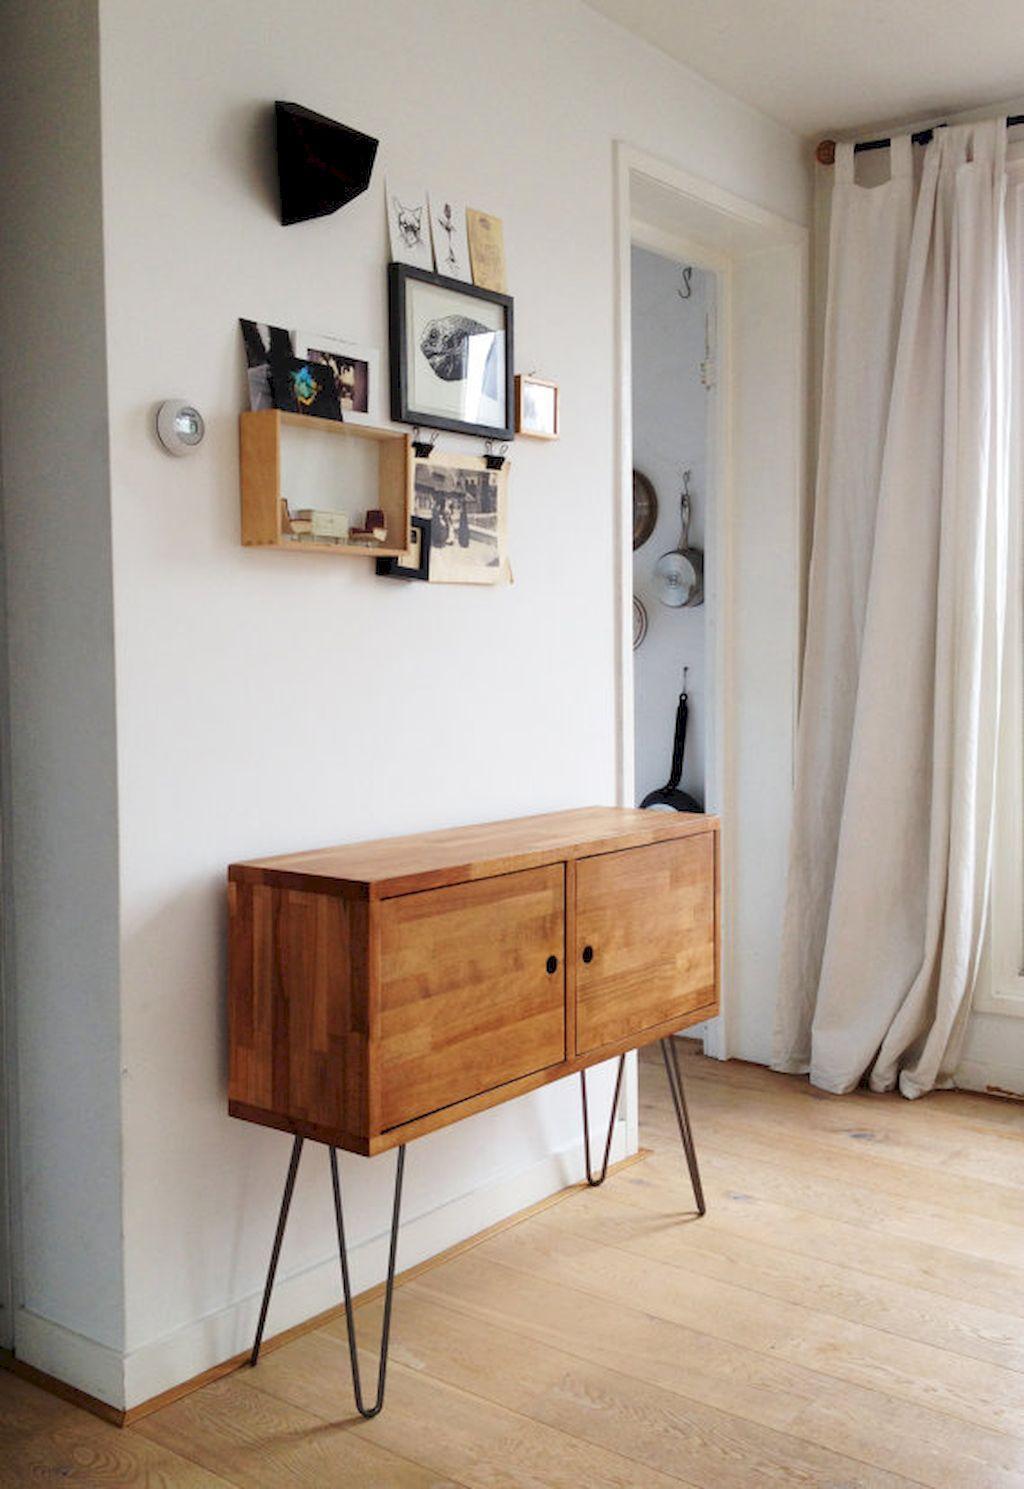 45 Adorable Mid Century Home Decor Ideas